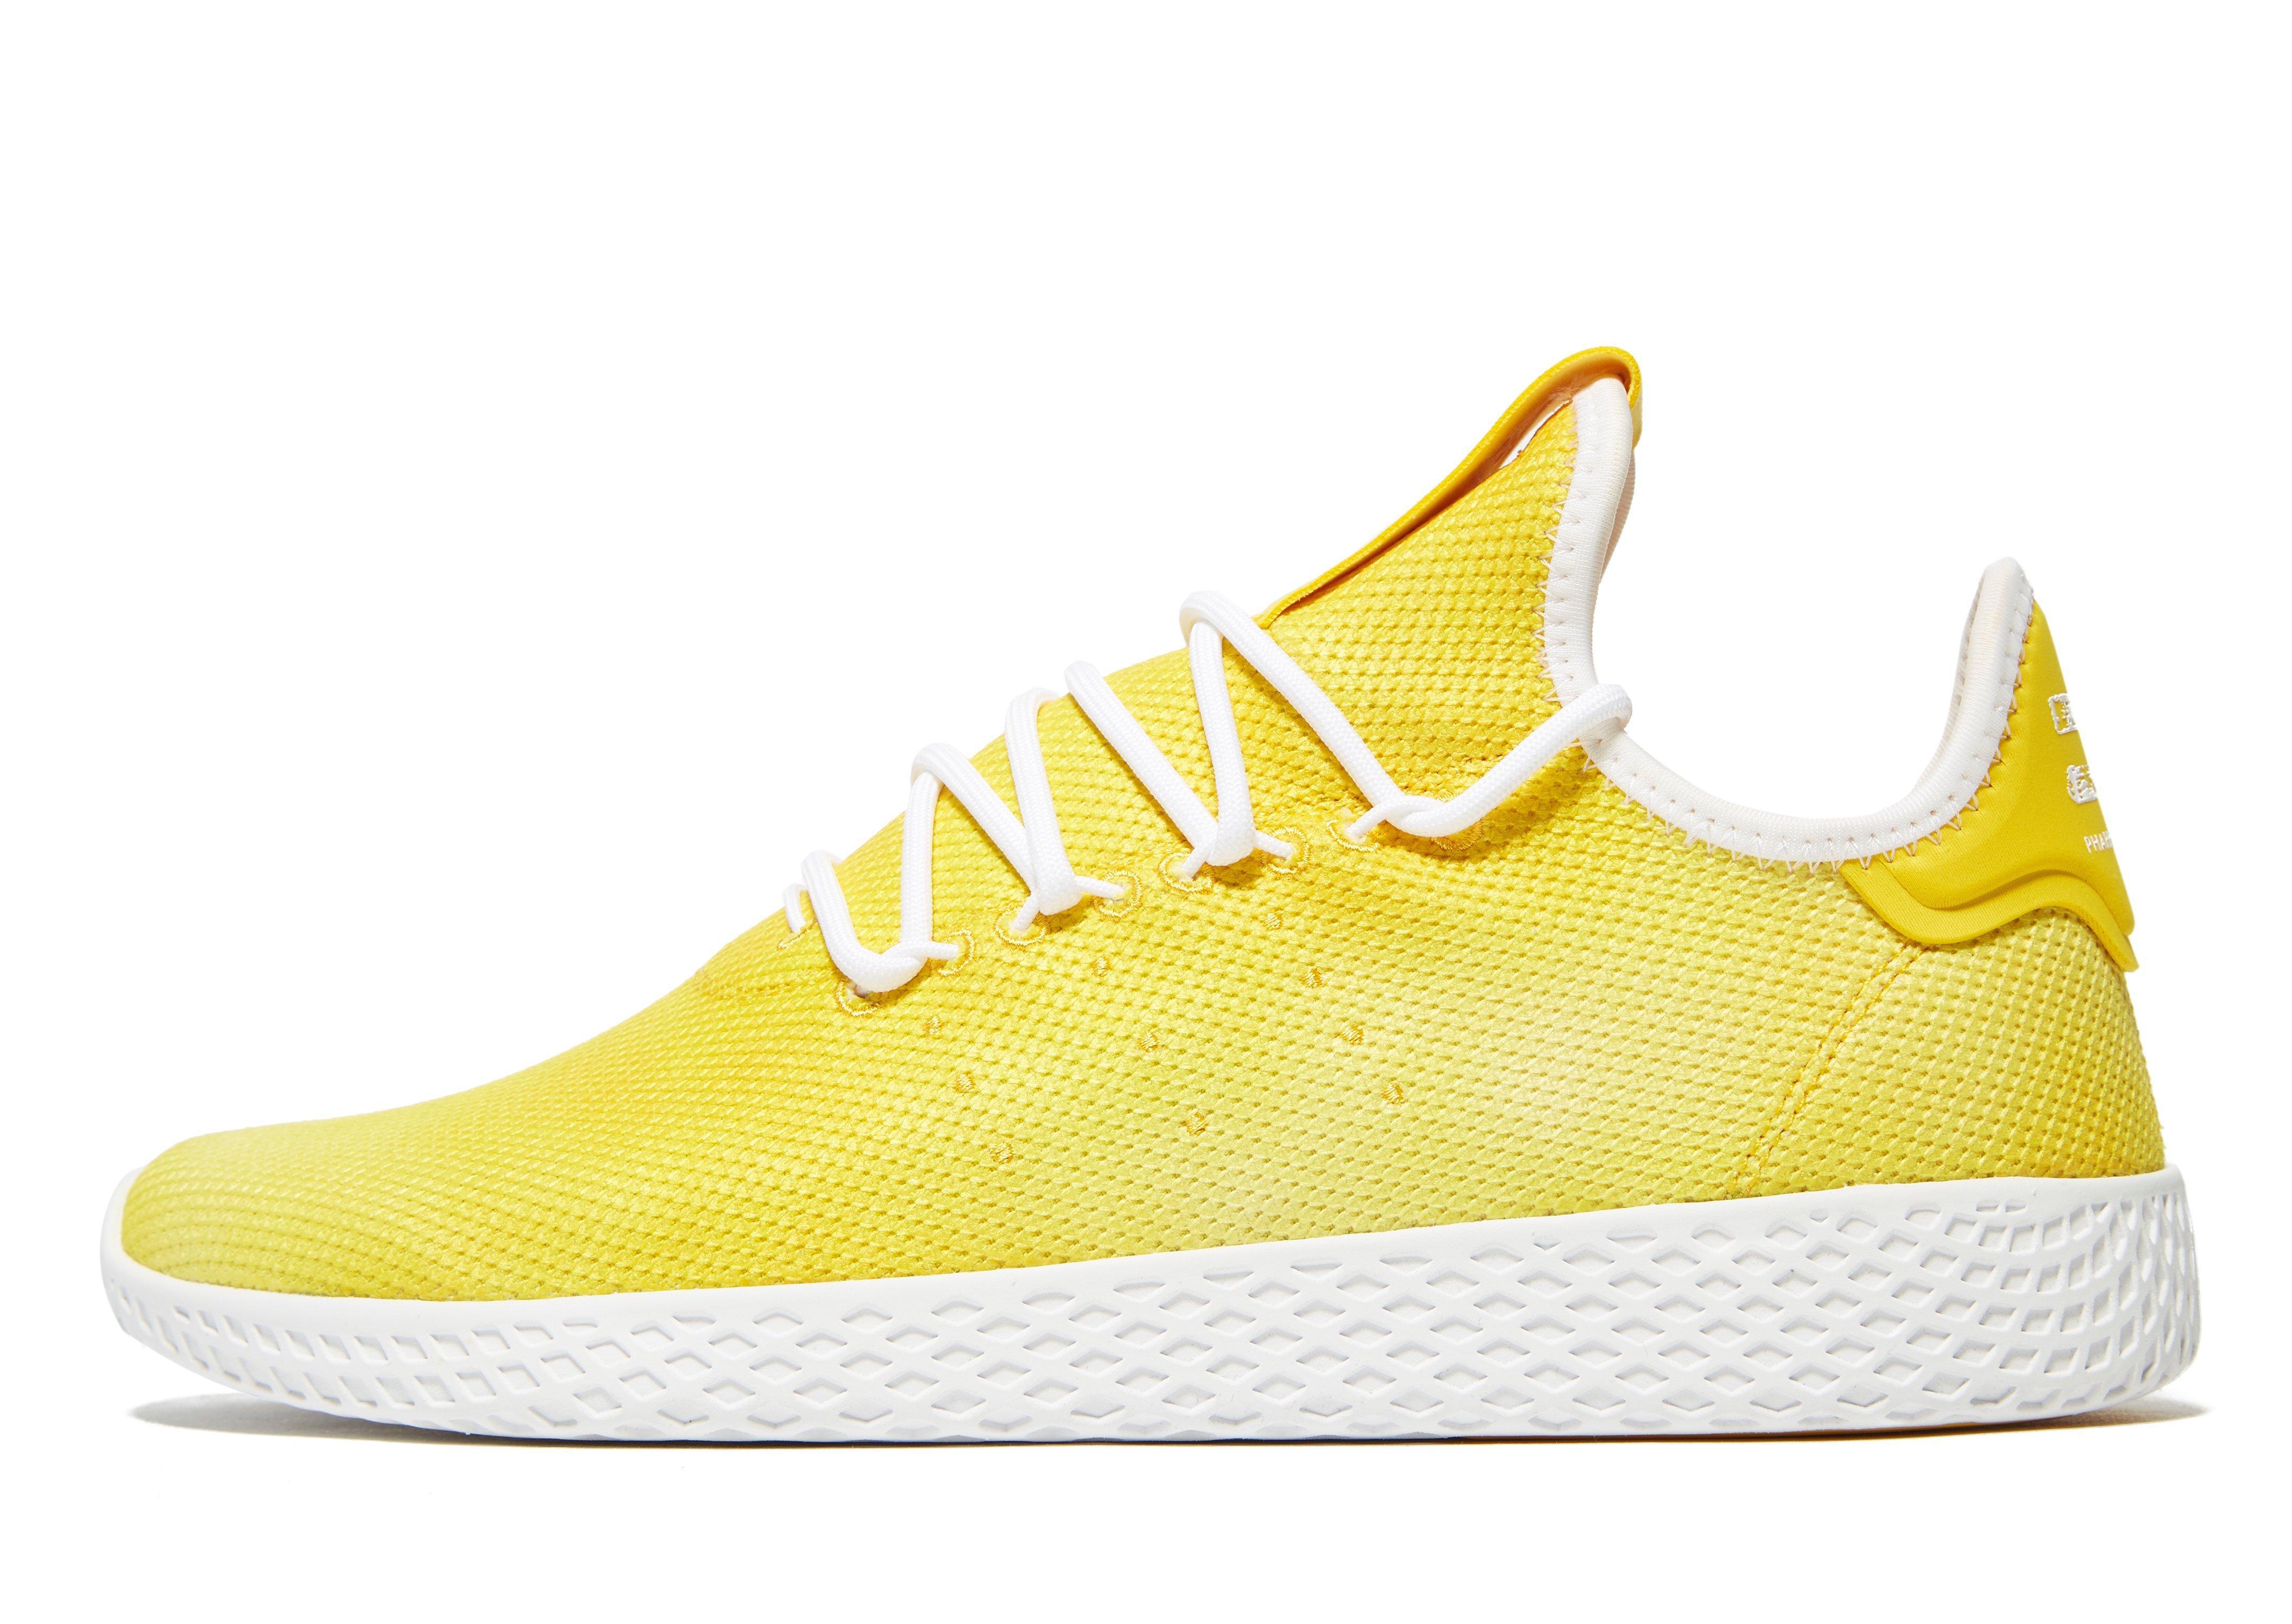 0ec2b5973 Lyst - adidas Originals X Pharrell Williams Holi Tennis Hu in Yellow